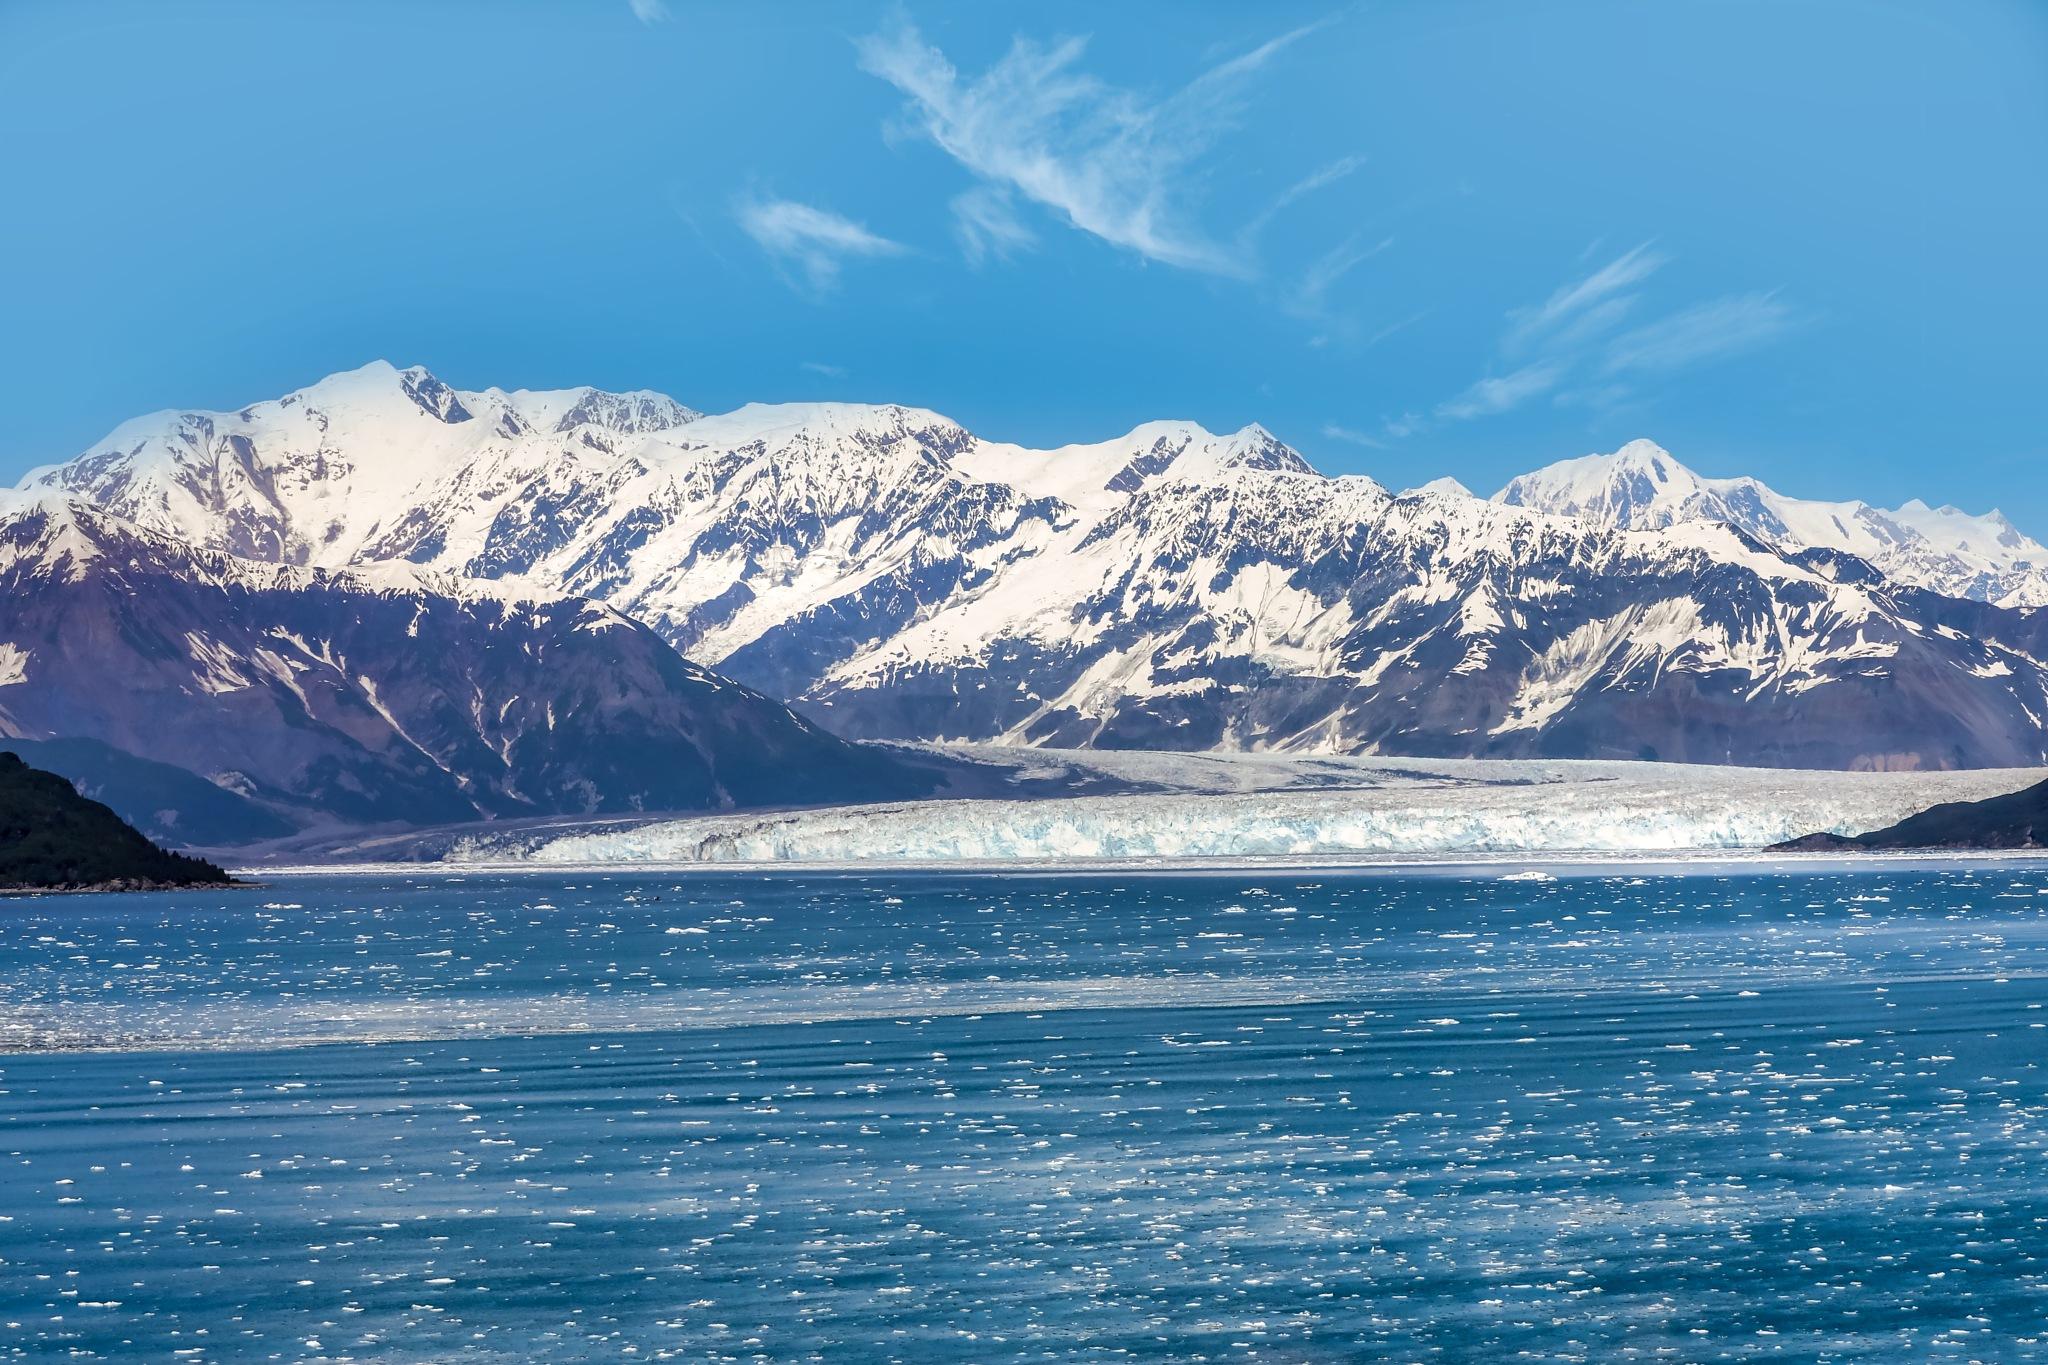 Hubbard glacier by Martina Birnbaum